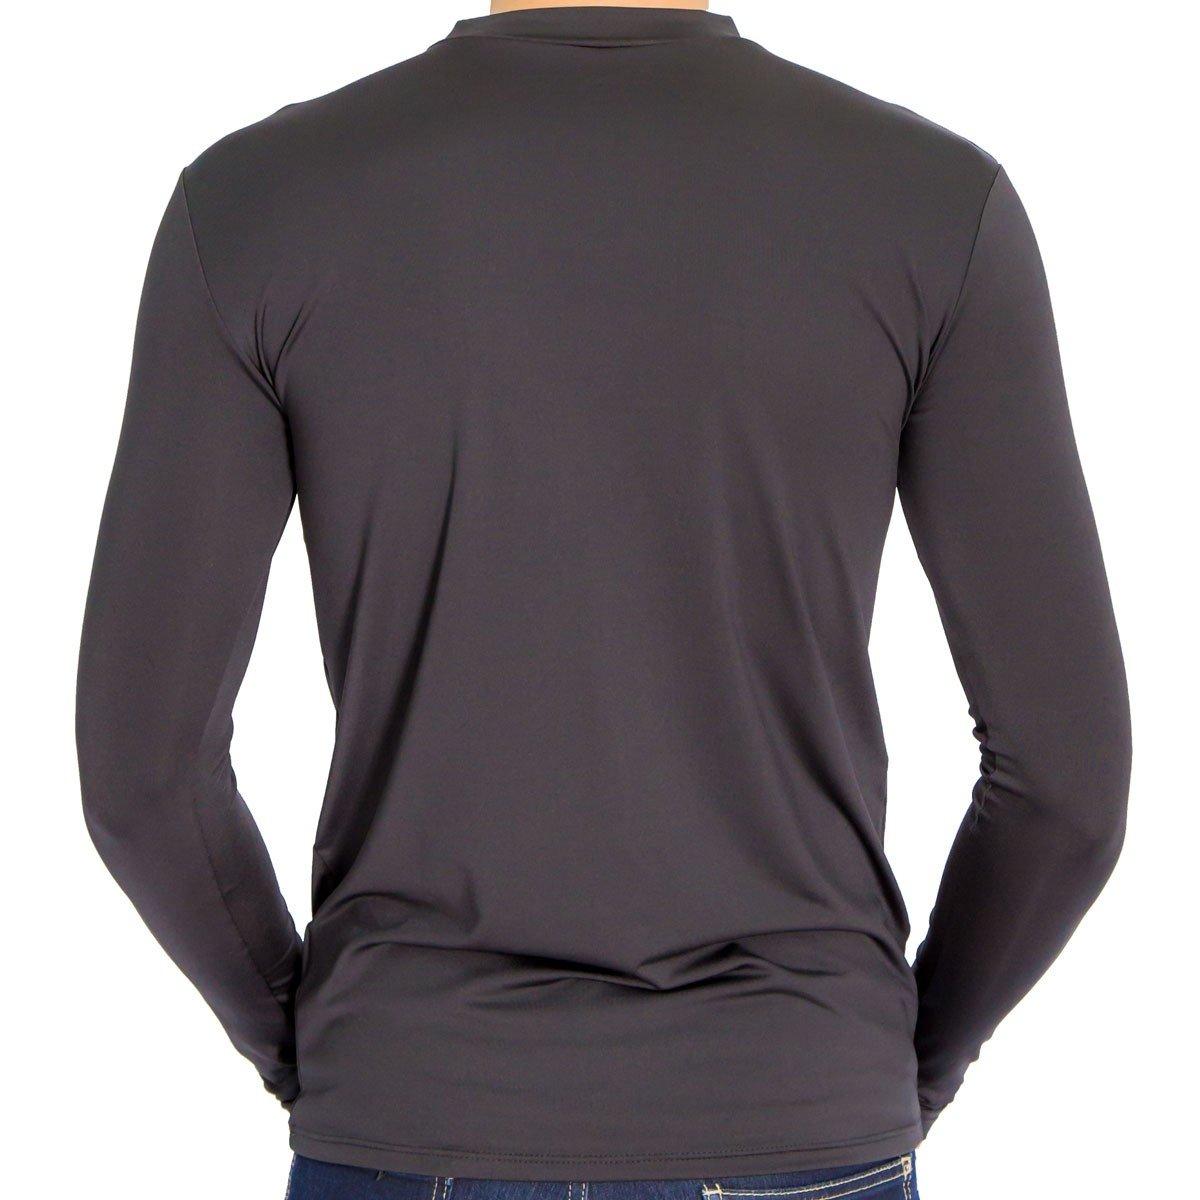 Camiseta Térmica Manga Longa Masculina  Camiseta Térmica Manga Longa  Masculina 11ad343748d0d